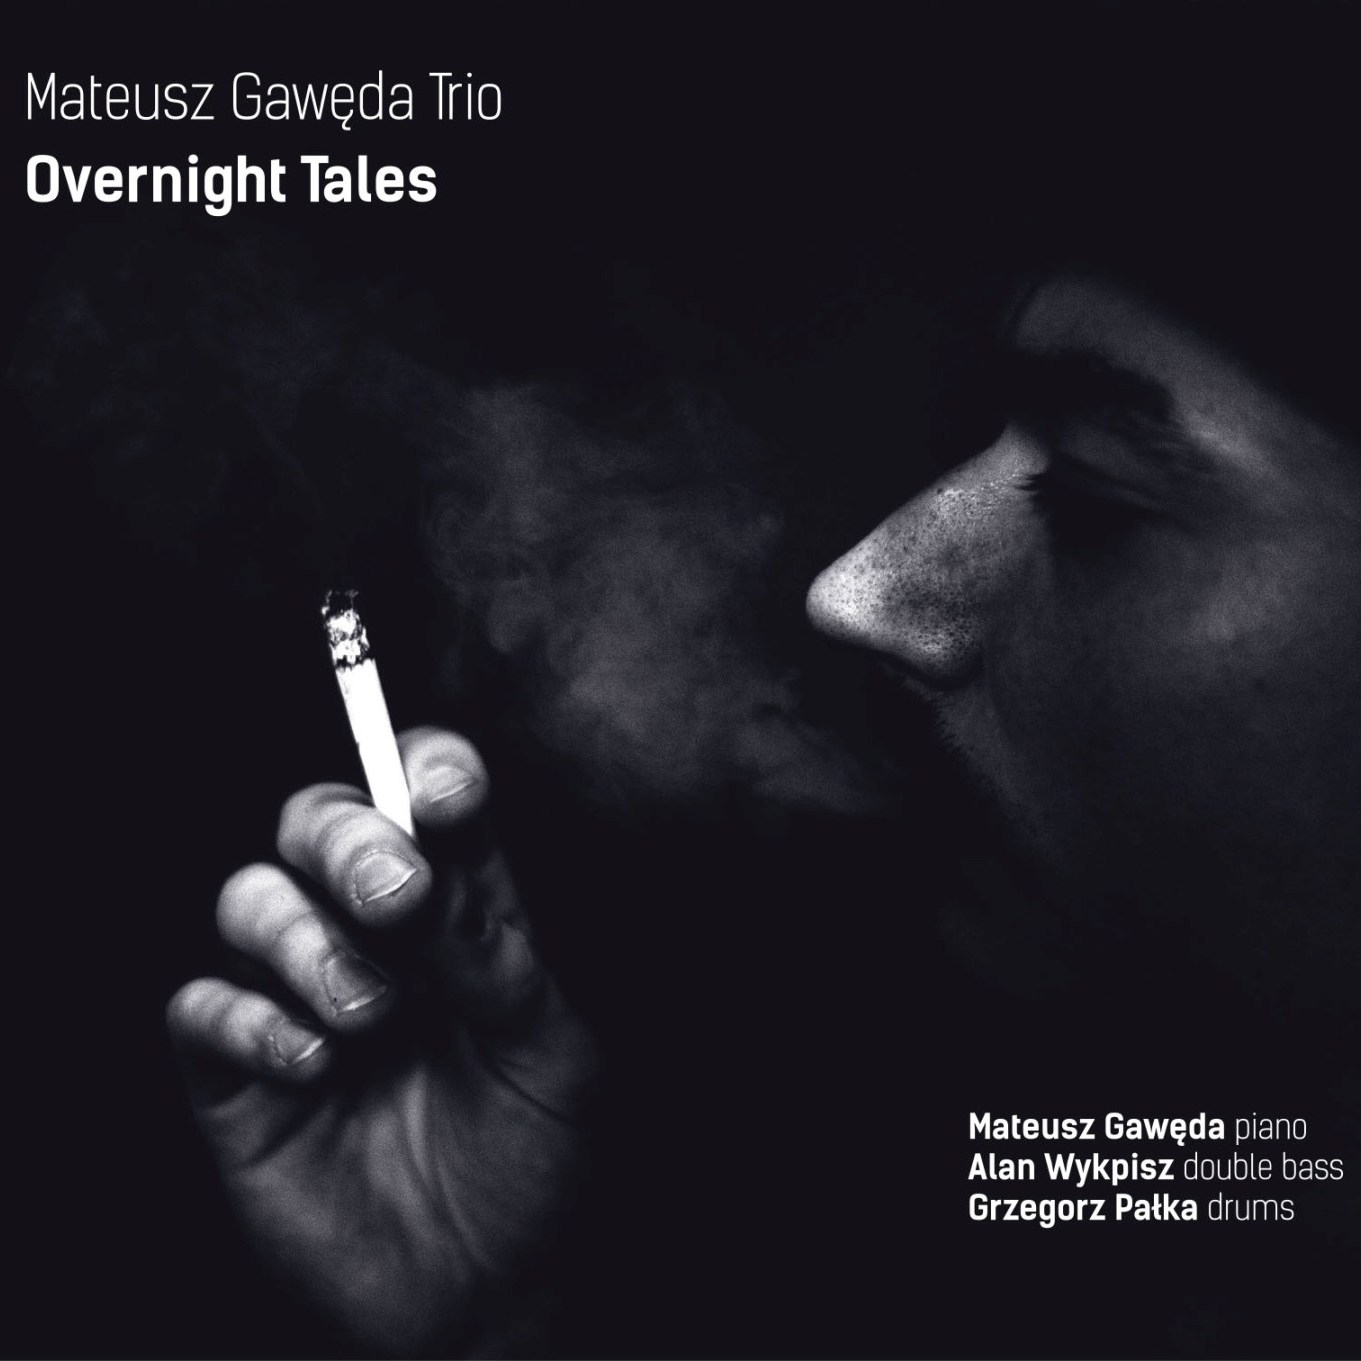 mateusz-gaweda-trio-cover